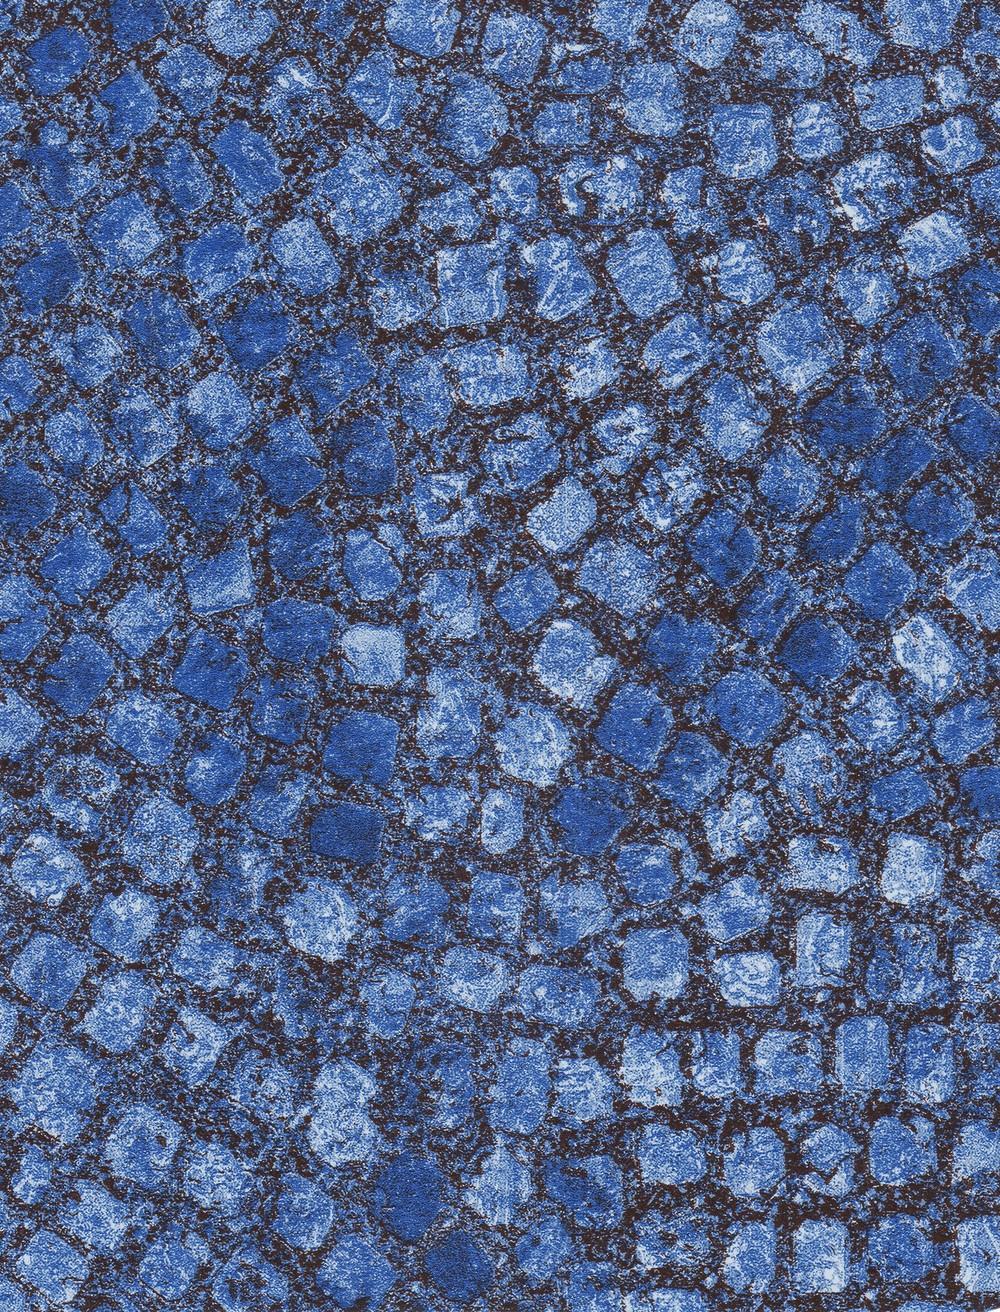 Bysantin Blue